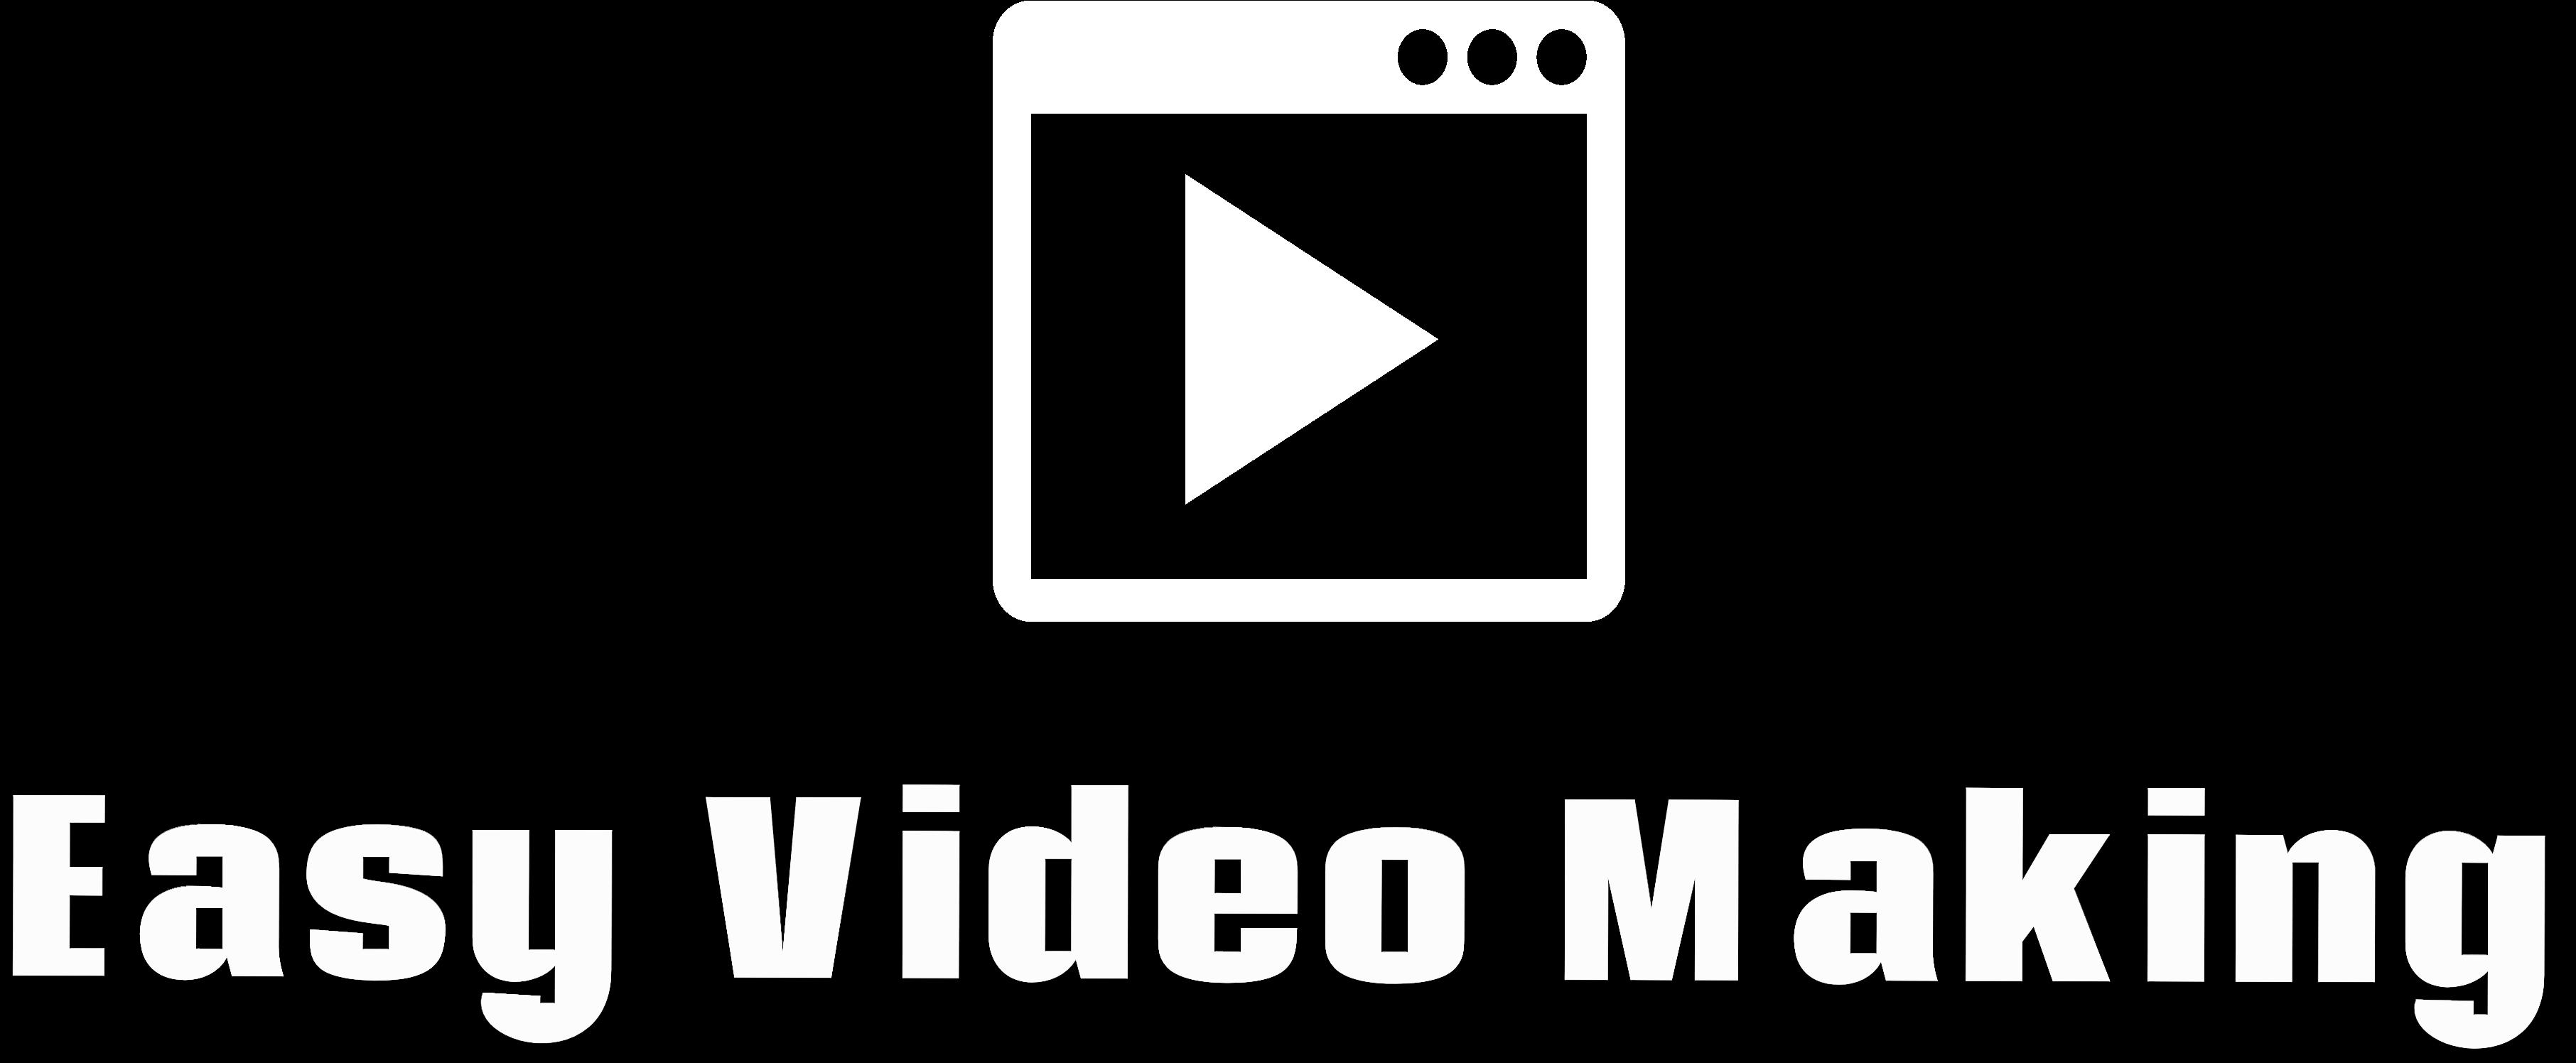 Easy Video Making